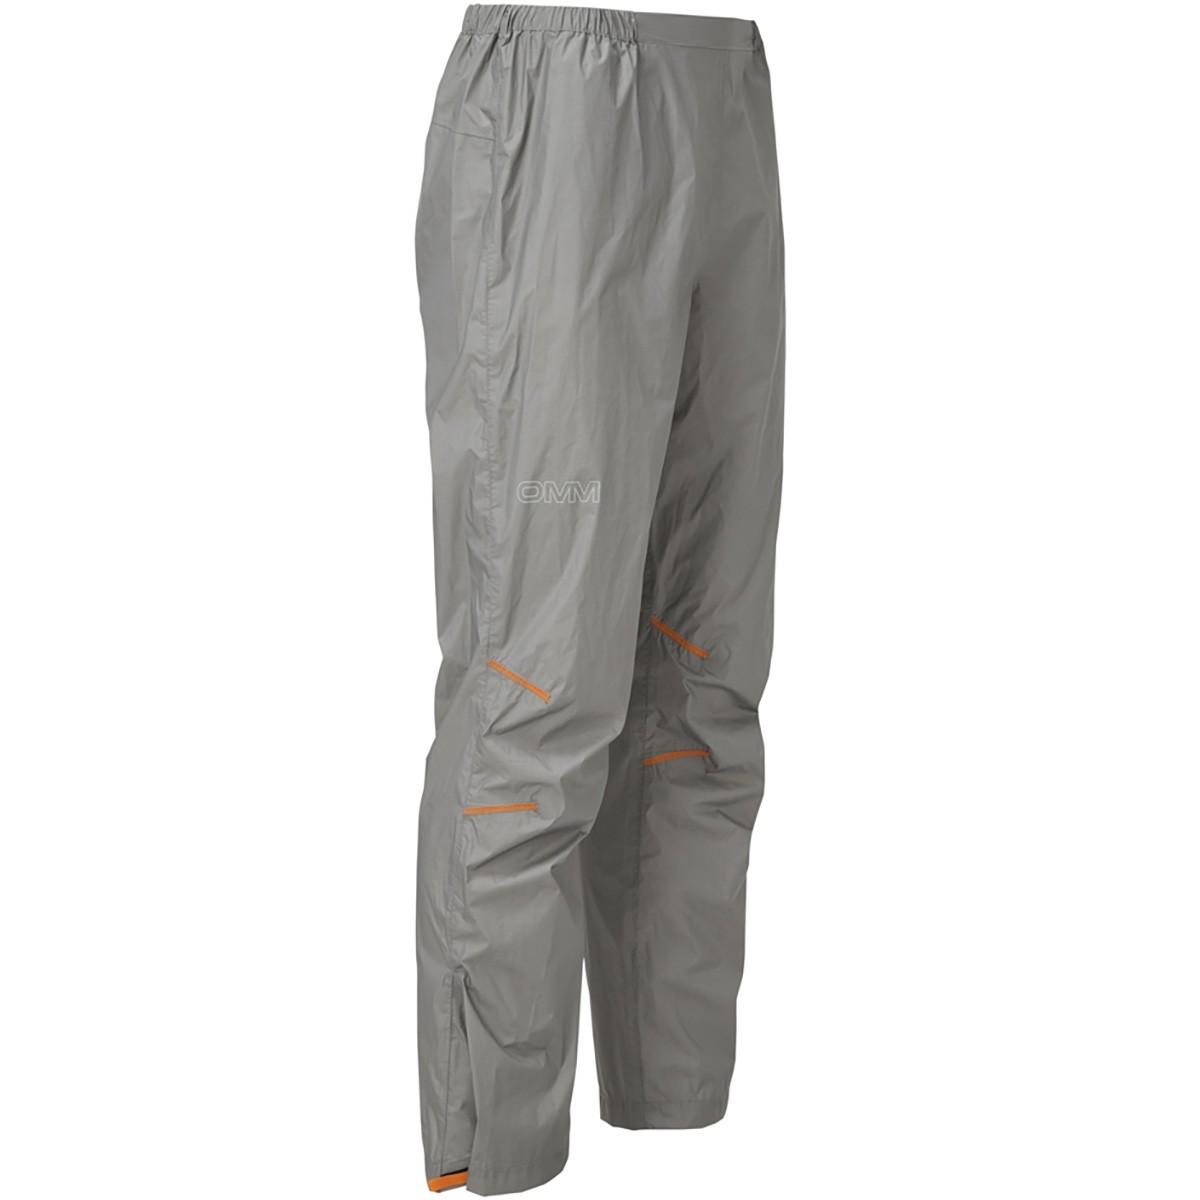 OMM Halo Men's Waterproof Pants - Grey - side